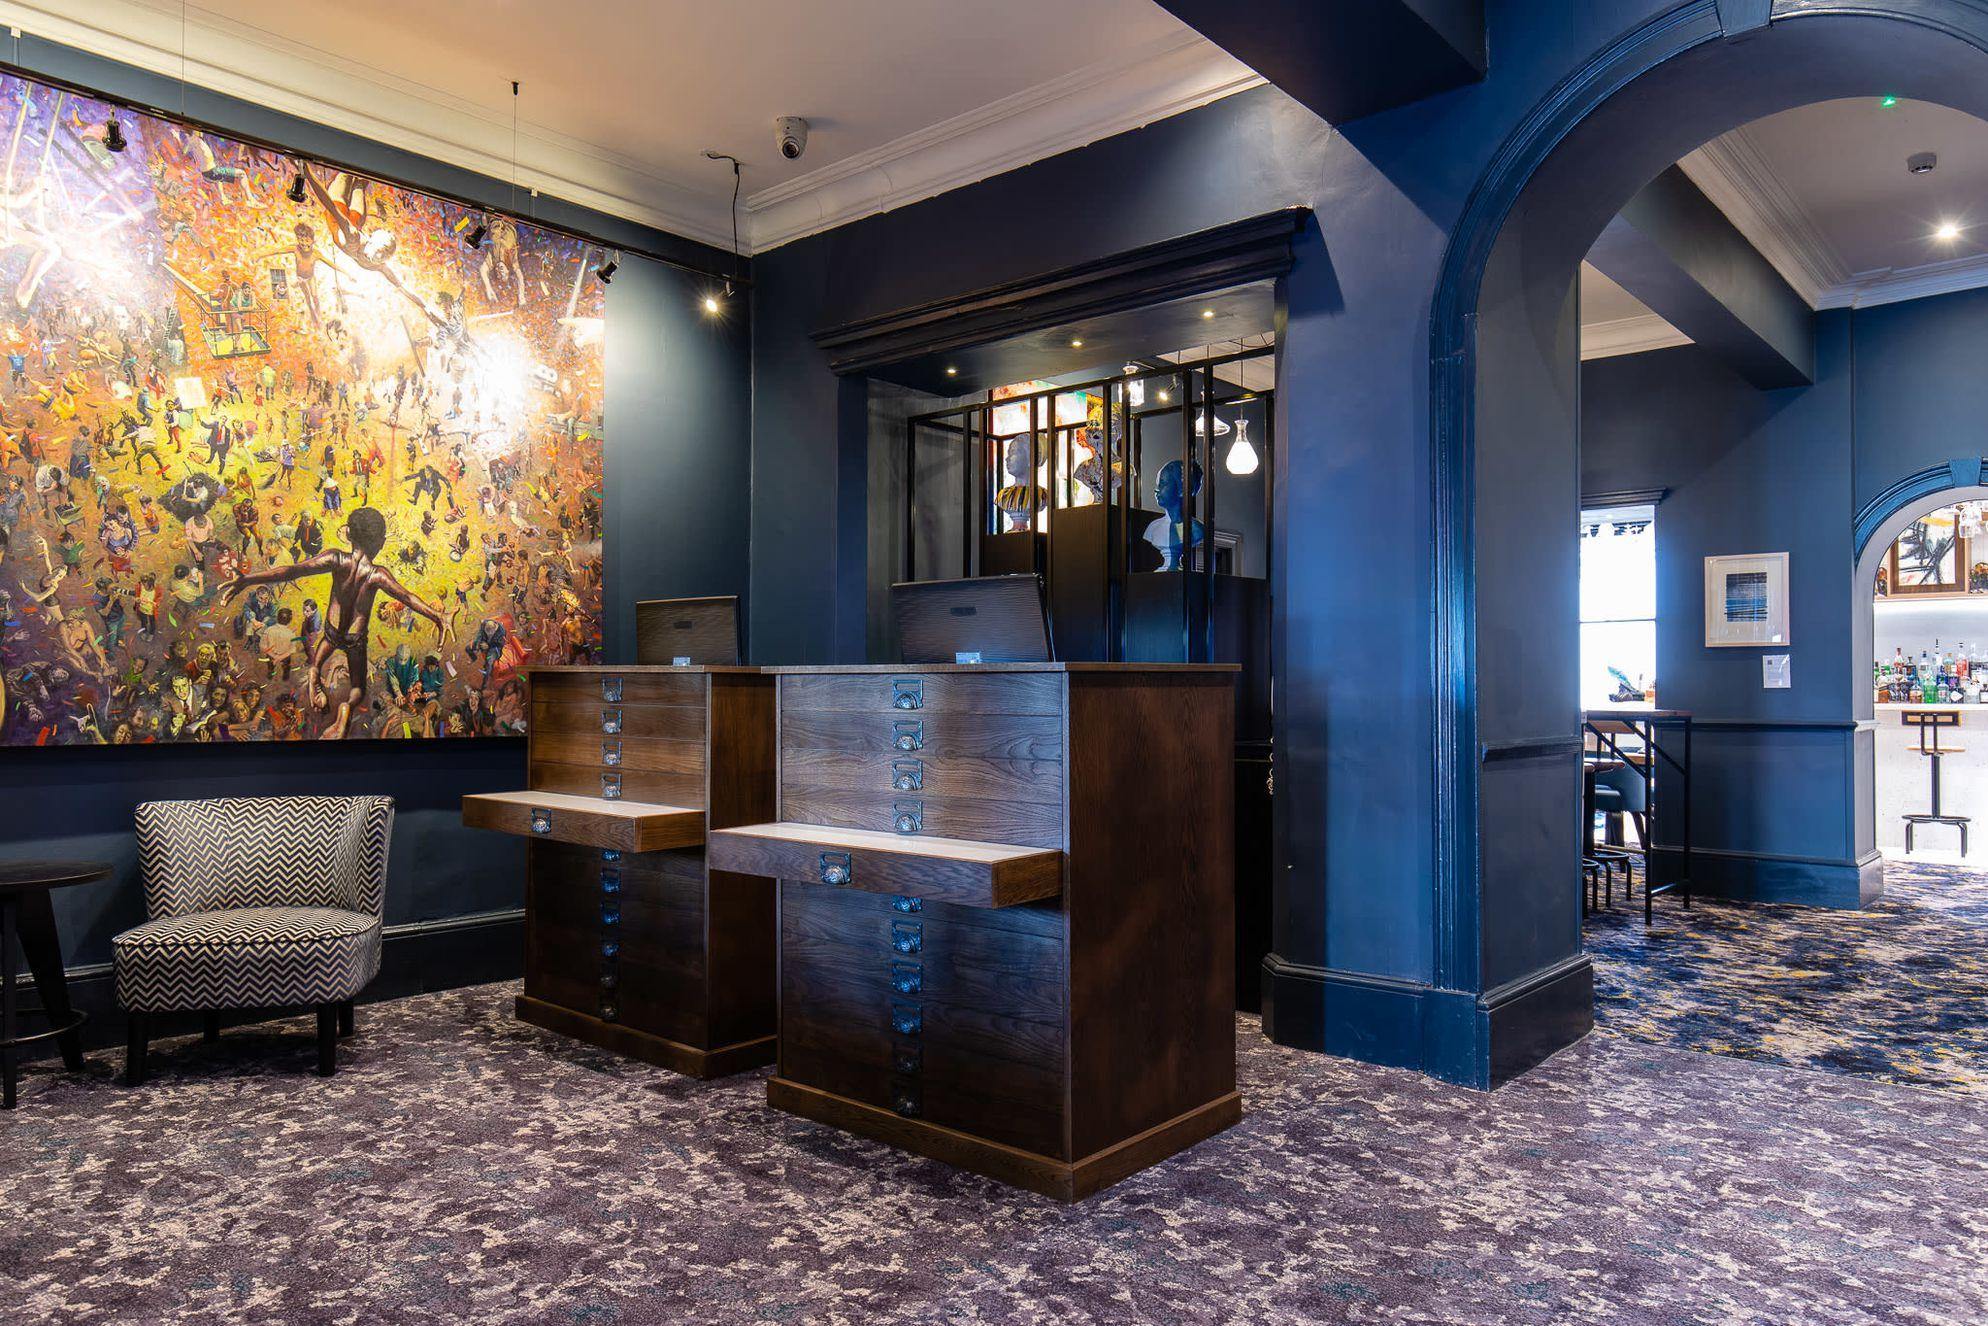 Abbey Hotel - Gallery